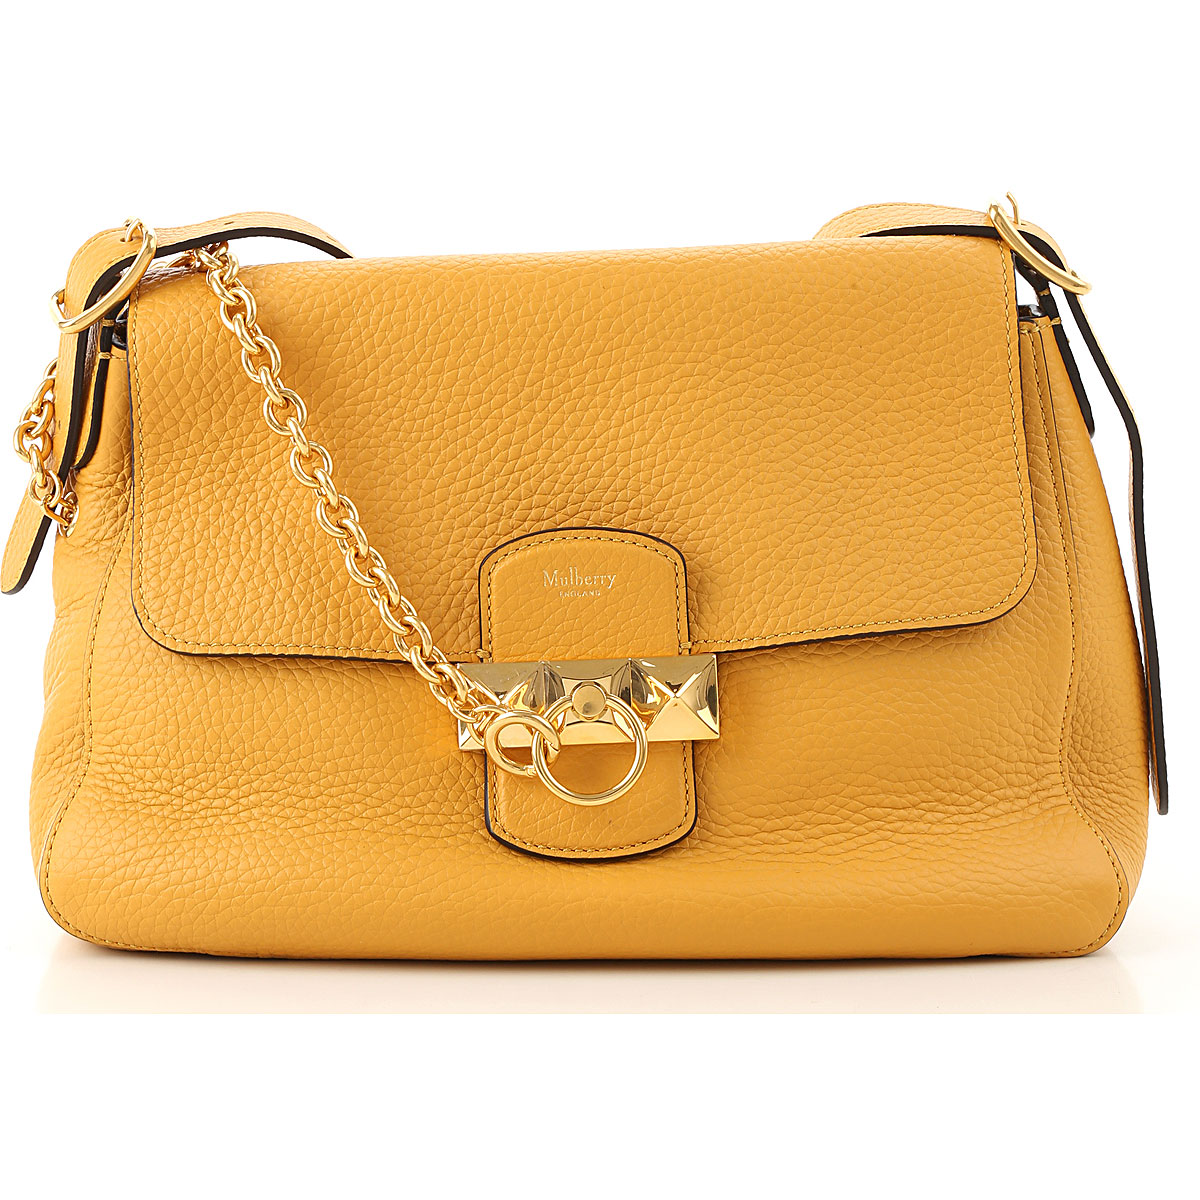 Mulberry Top Handle Handbag On Sale, Yellow, Leather, 2019